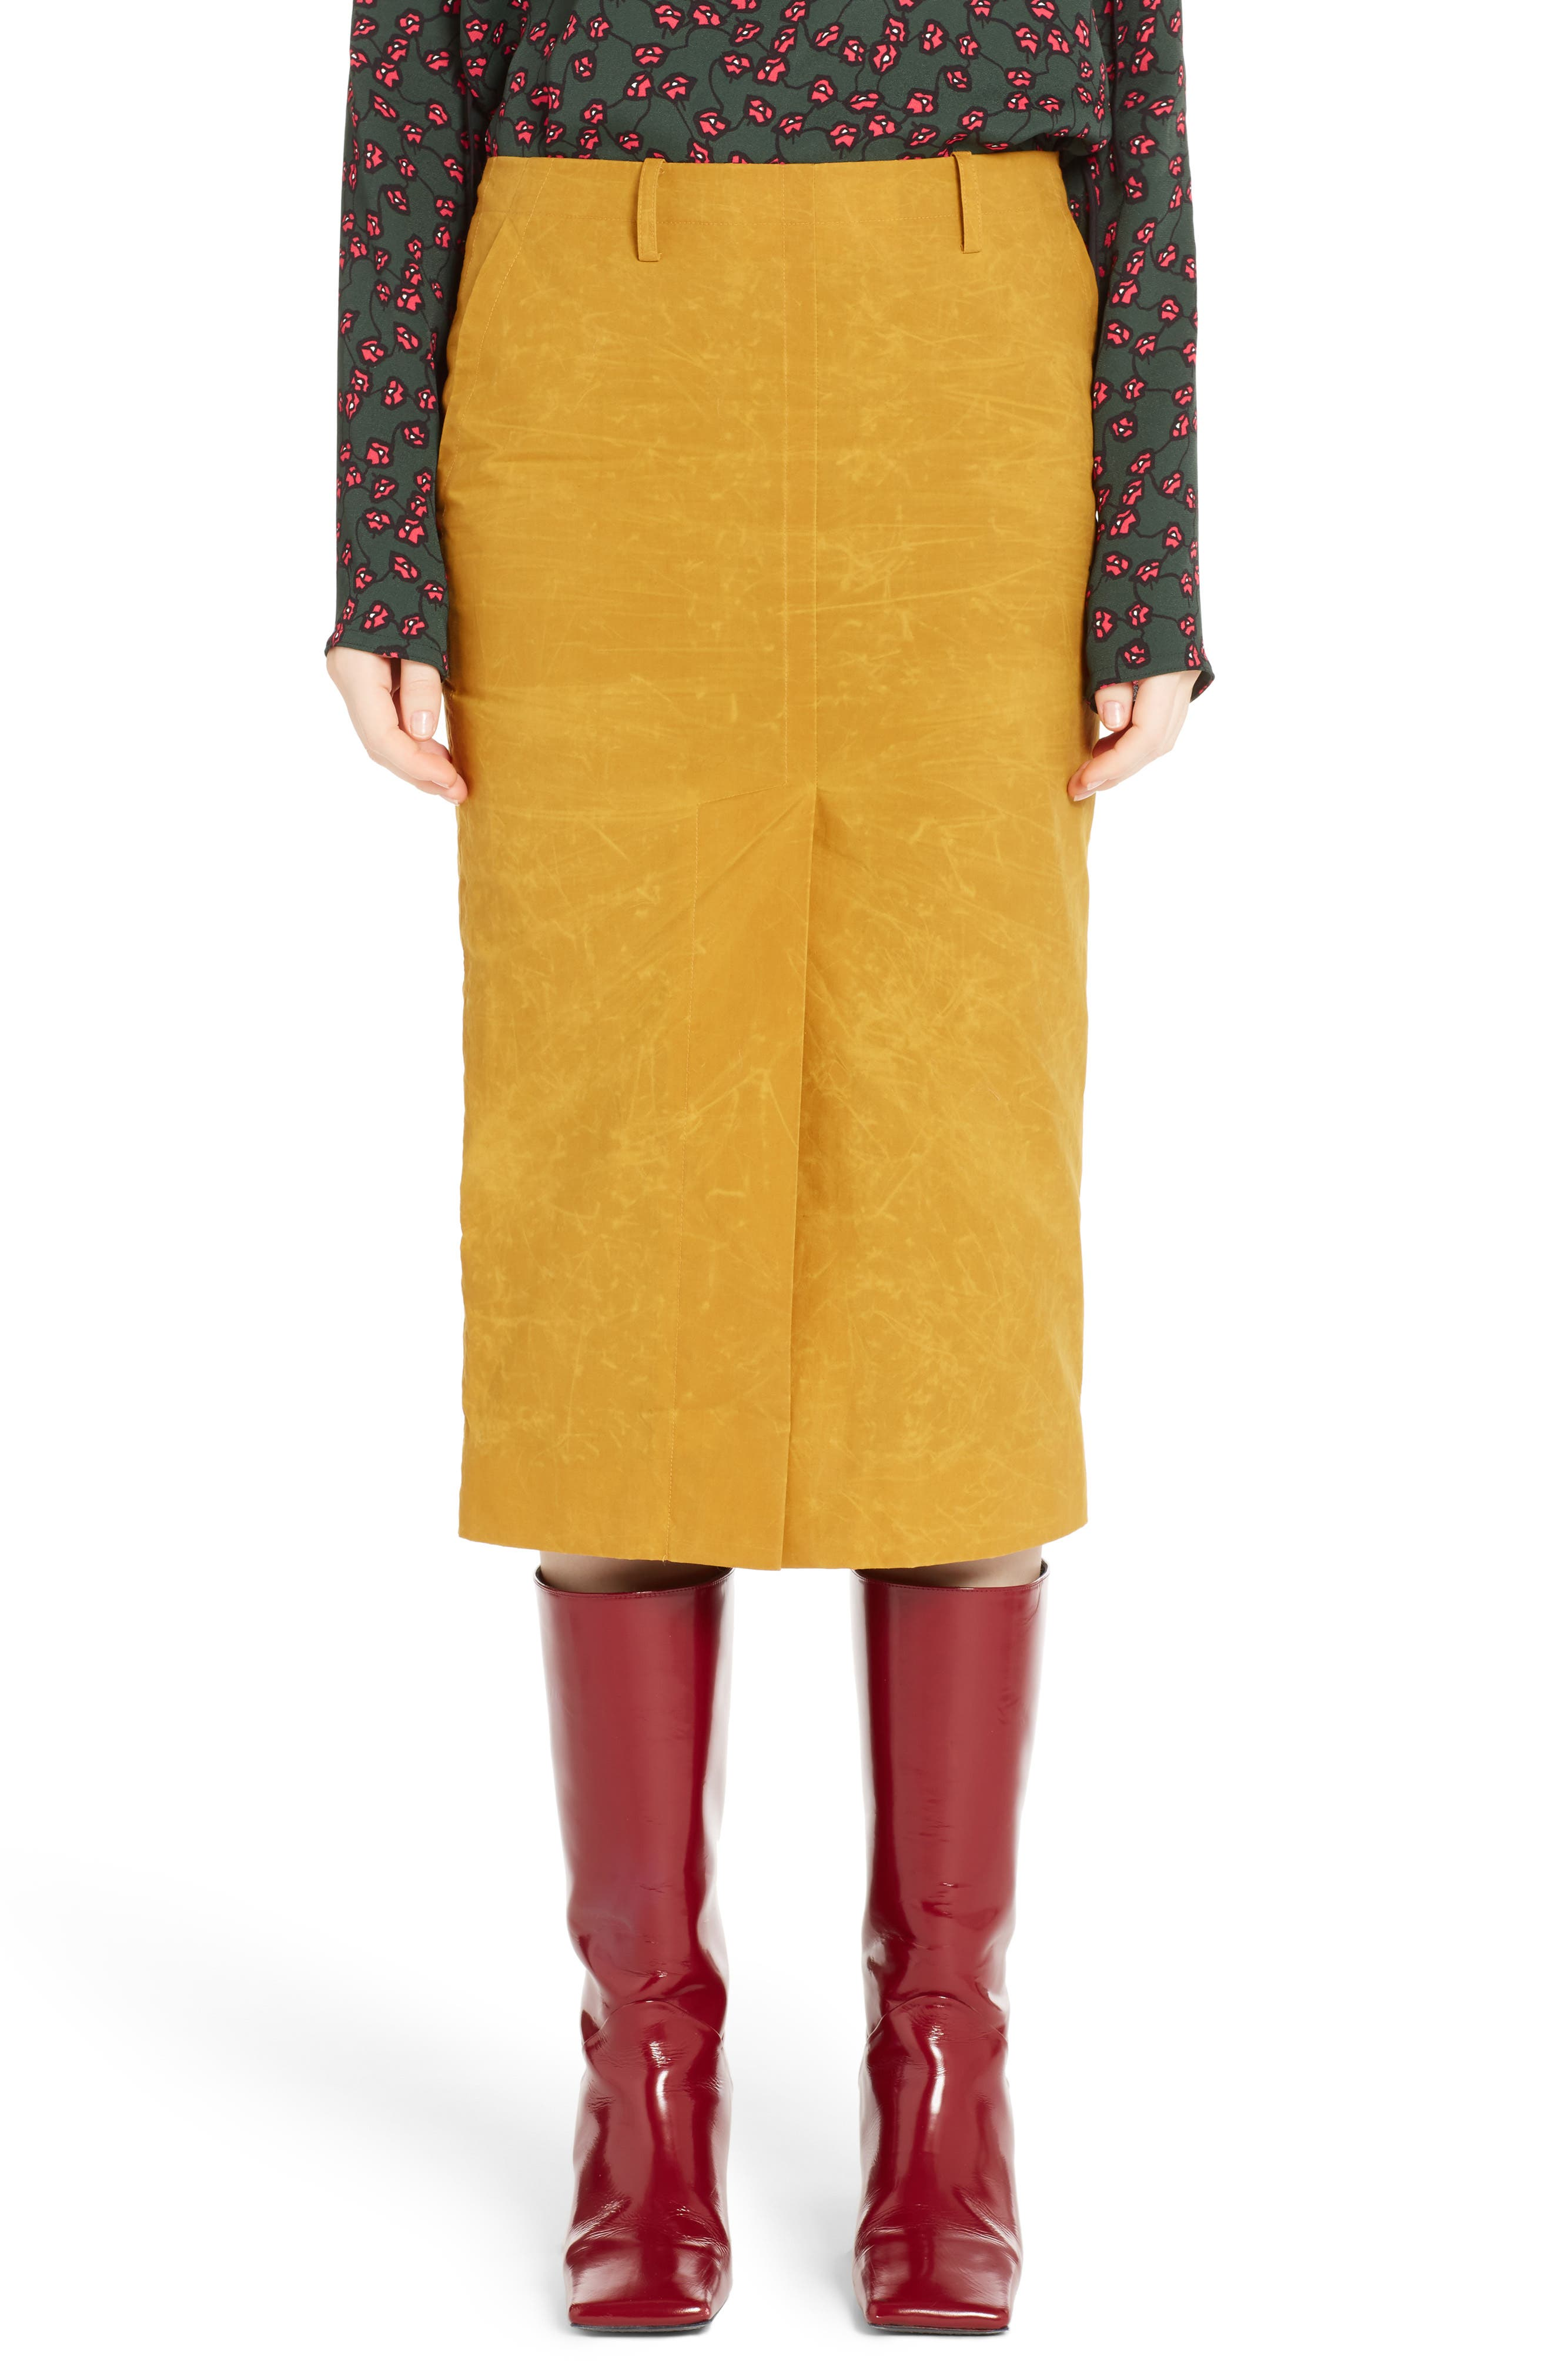 Alternate Image 1 Selected - Marni Waxed Cotton Pencil Skirt